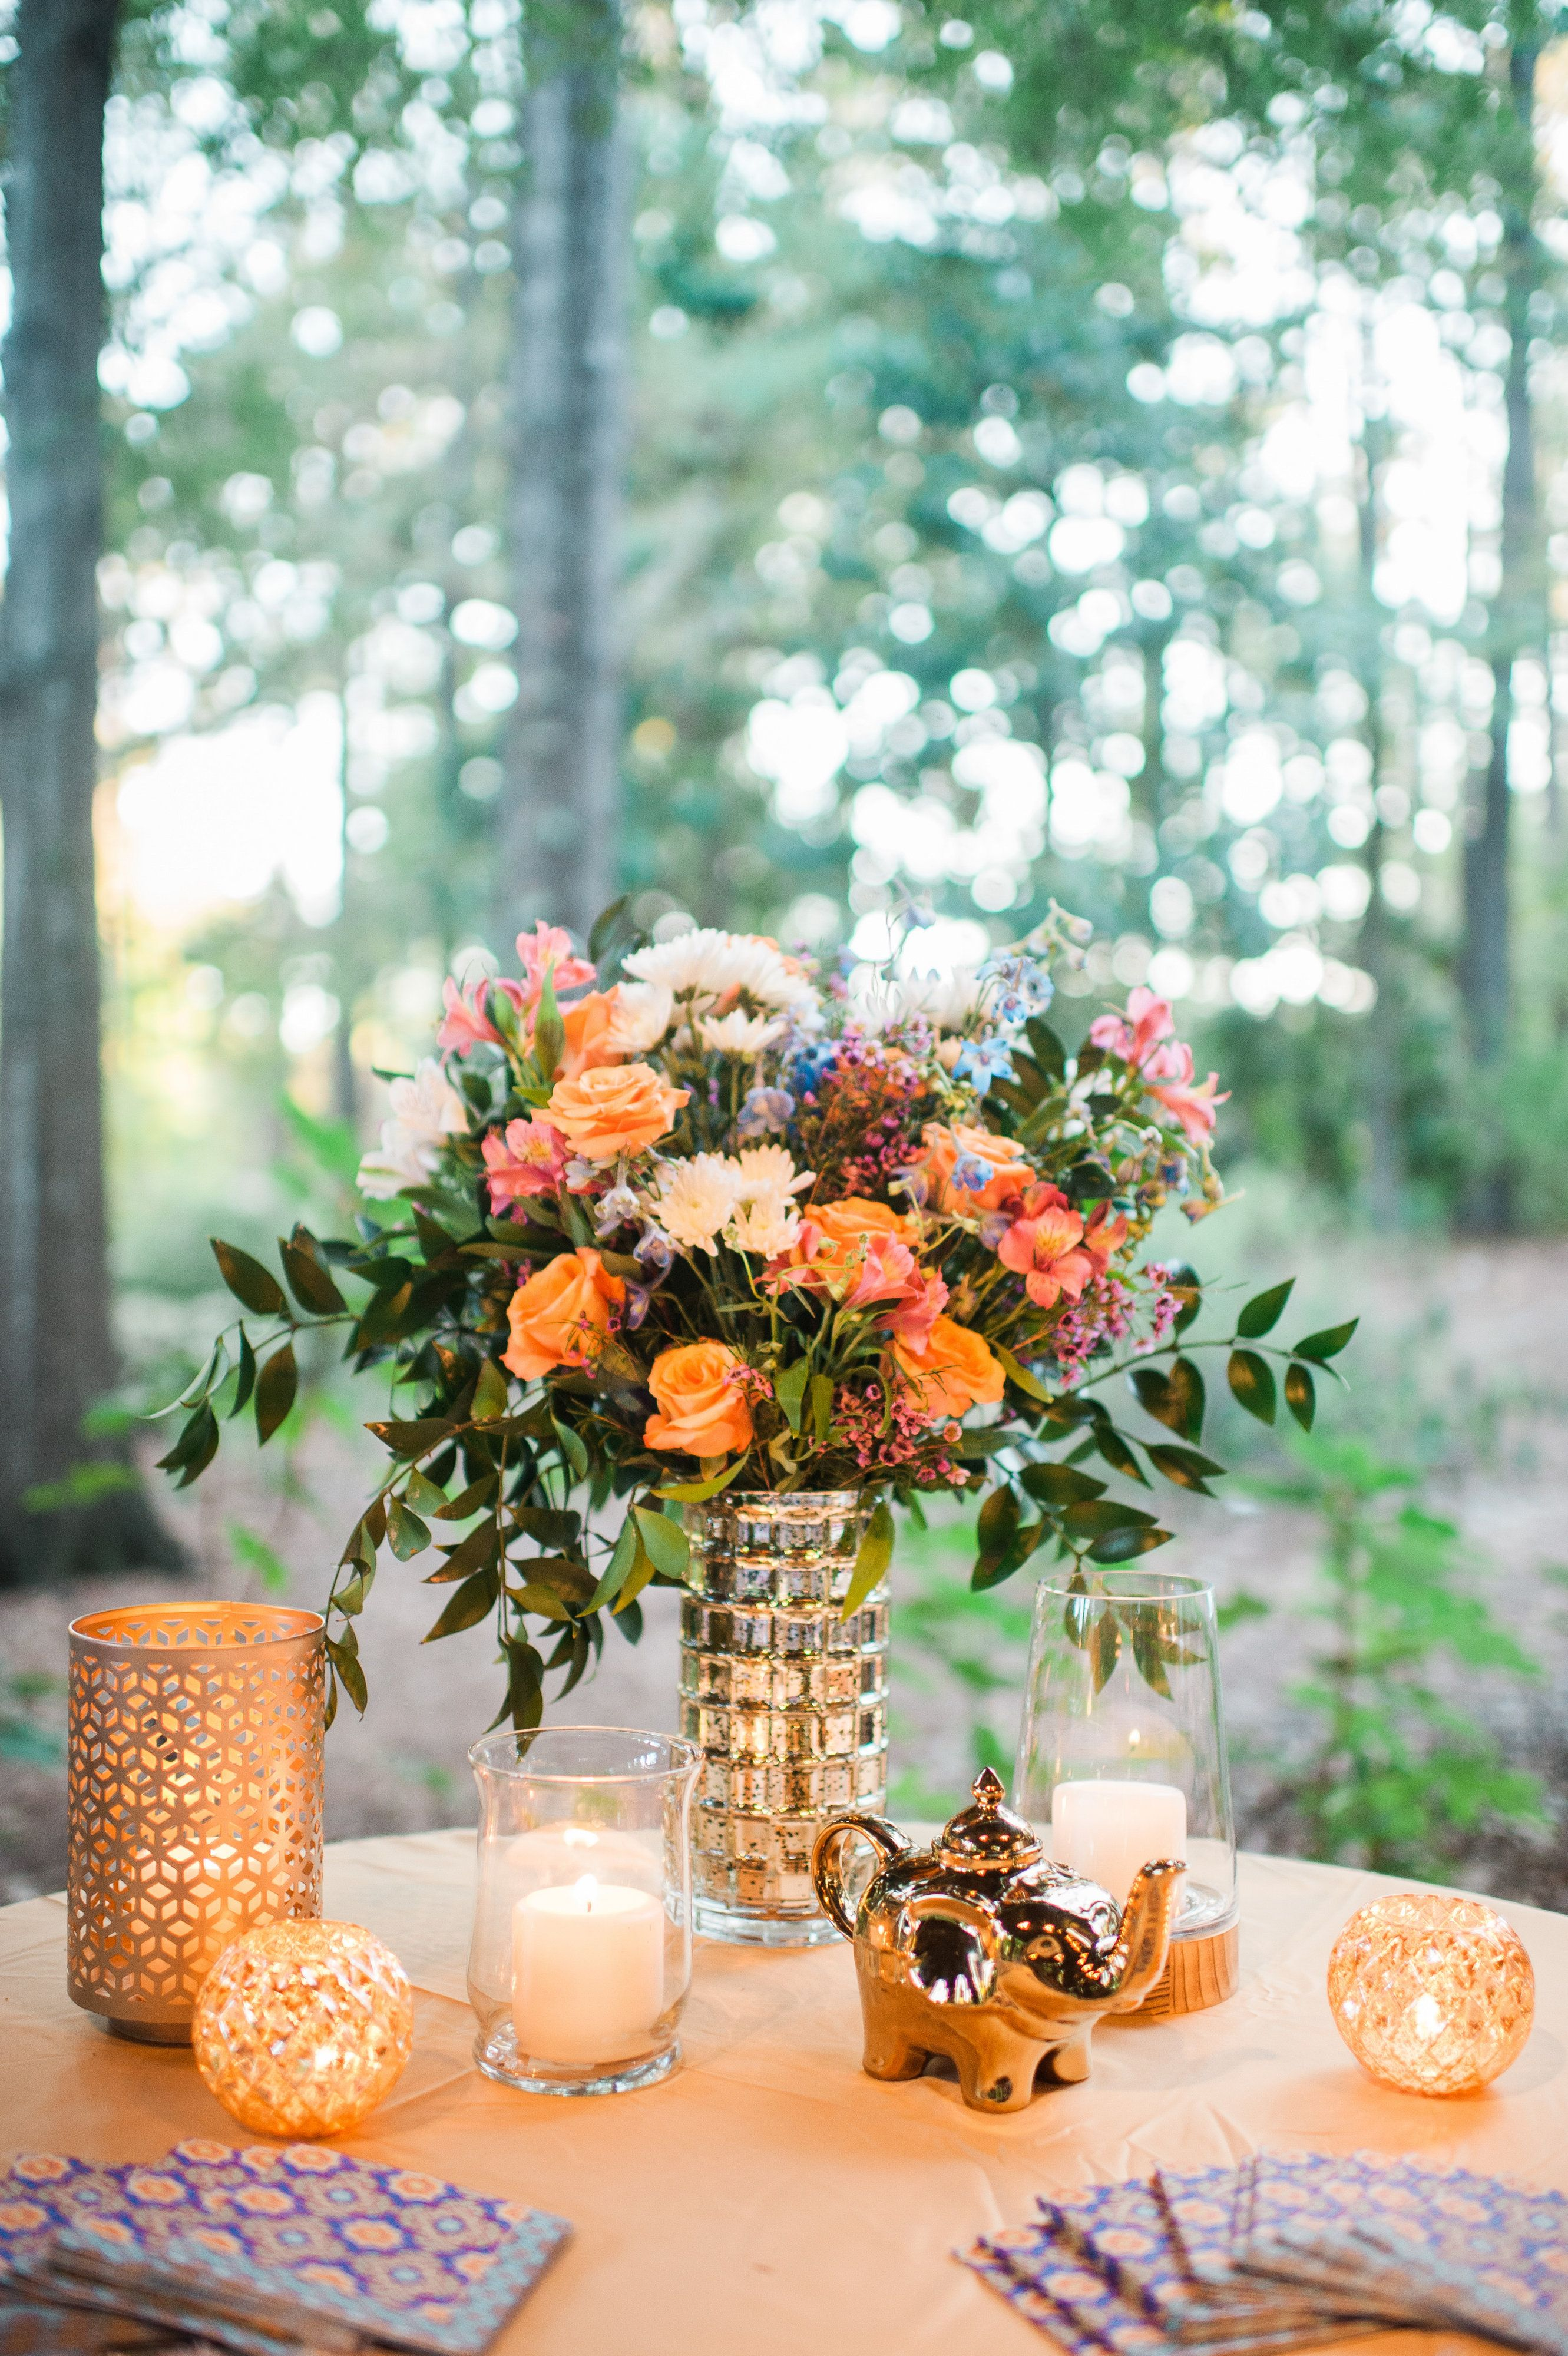 event: mehndi wedding celebration | venue: aldridge gardens, Gartengerate ideen